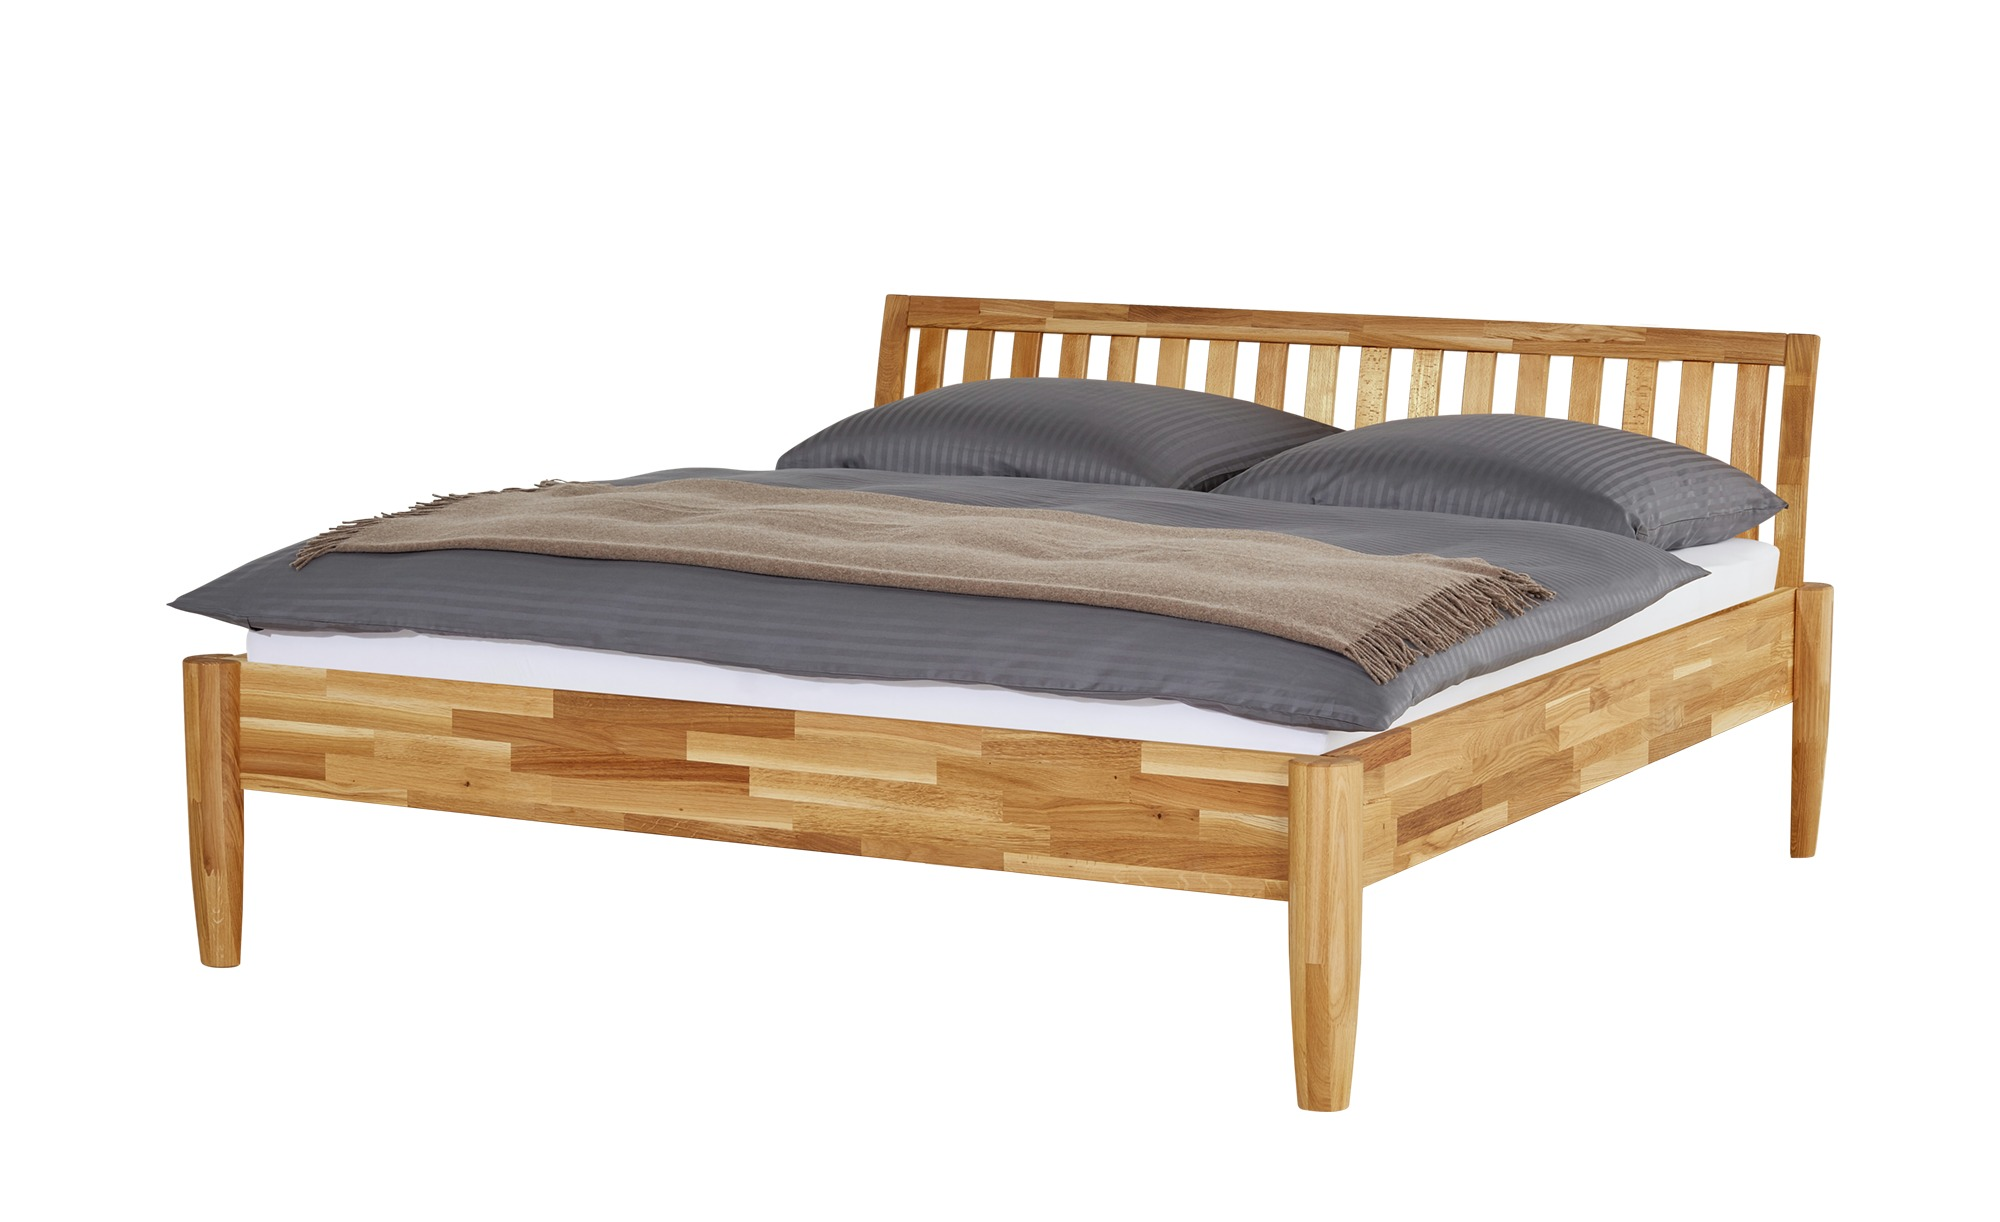 Massivholz-Bettgestell  Timber ¦ holzfarben ¦ Maße (cm): B: 196 H: 93 Betten > Futonbetten - Höffner | Schlafzimmer > Betten > Futonbetten | Möbel Höffner DE